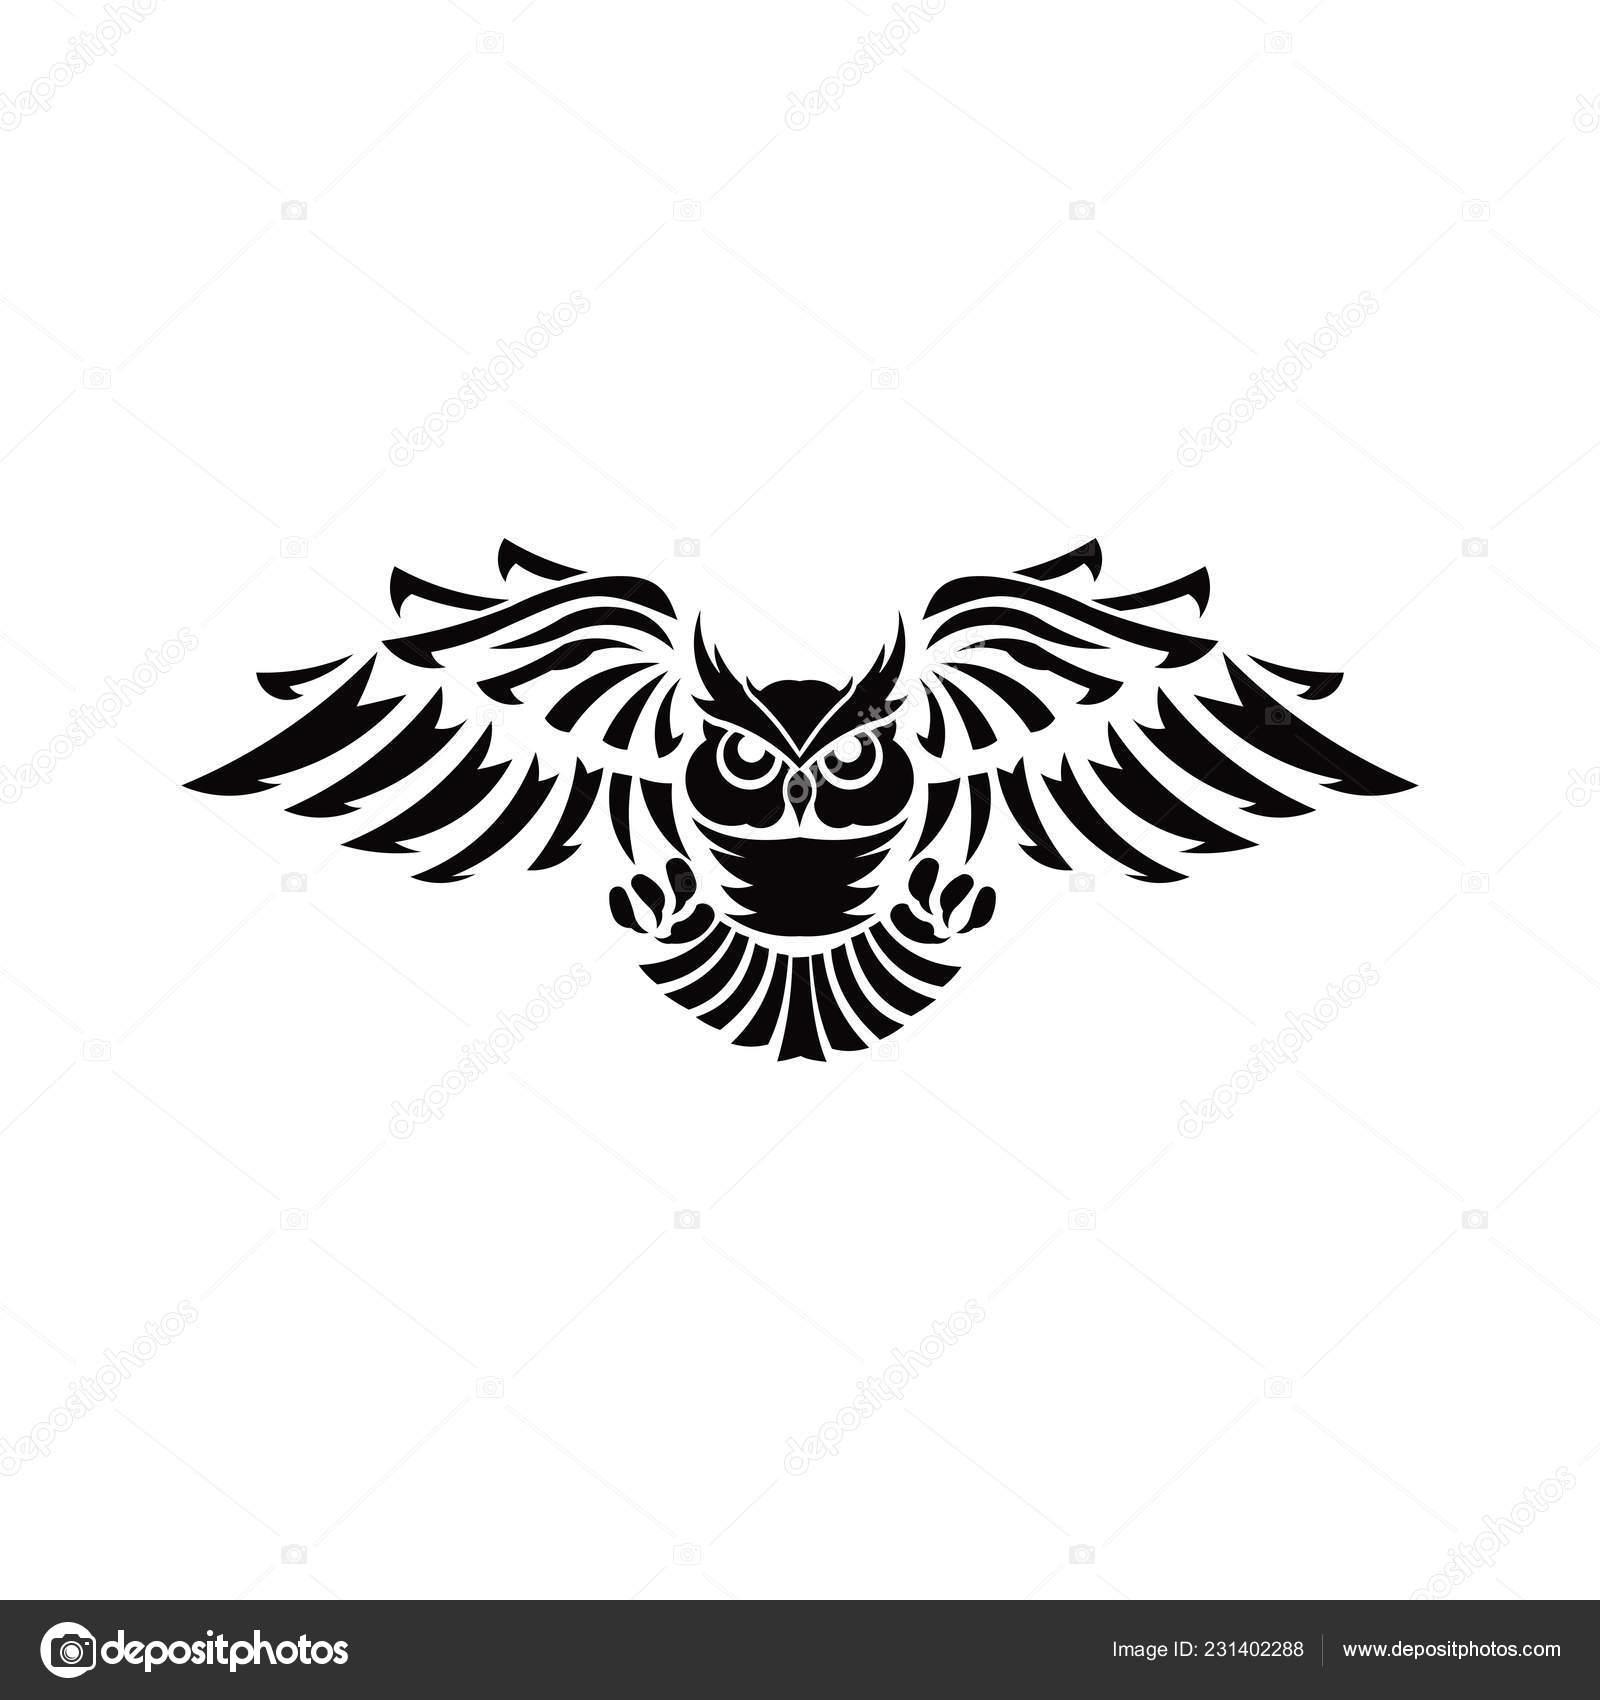 Owl Logo Vector Illustrations Emblem Design Black Background Inspiration Bird Stock Vector C Bentwajahpribumi Gmail Com 231402288